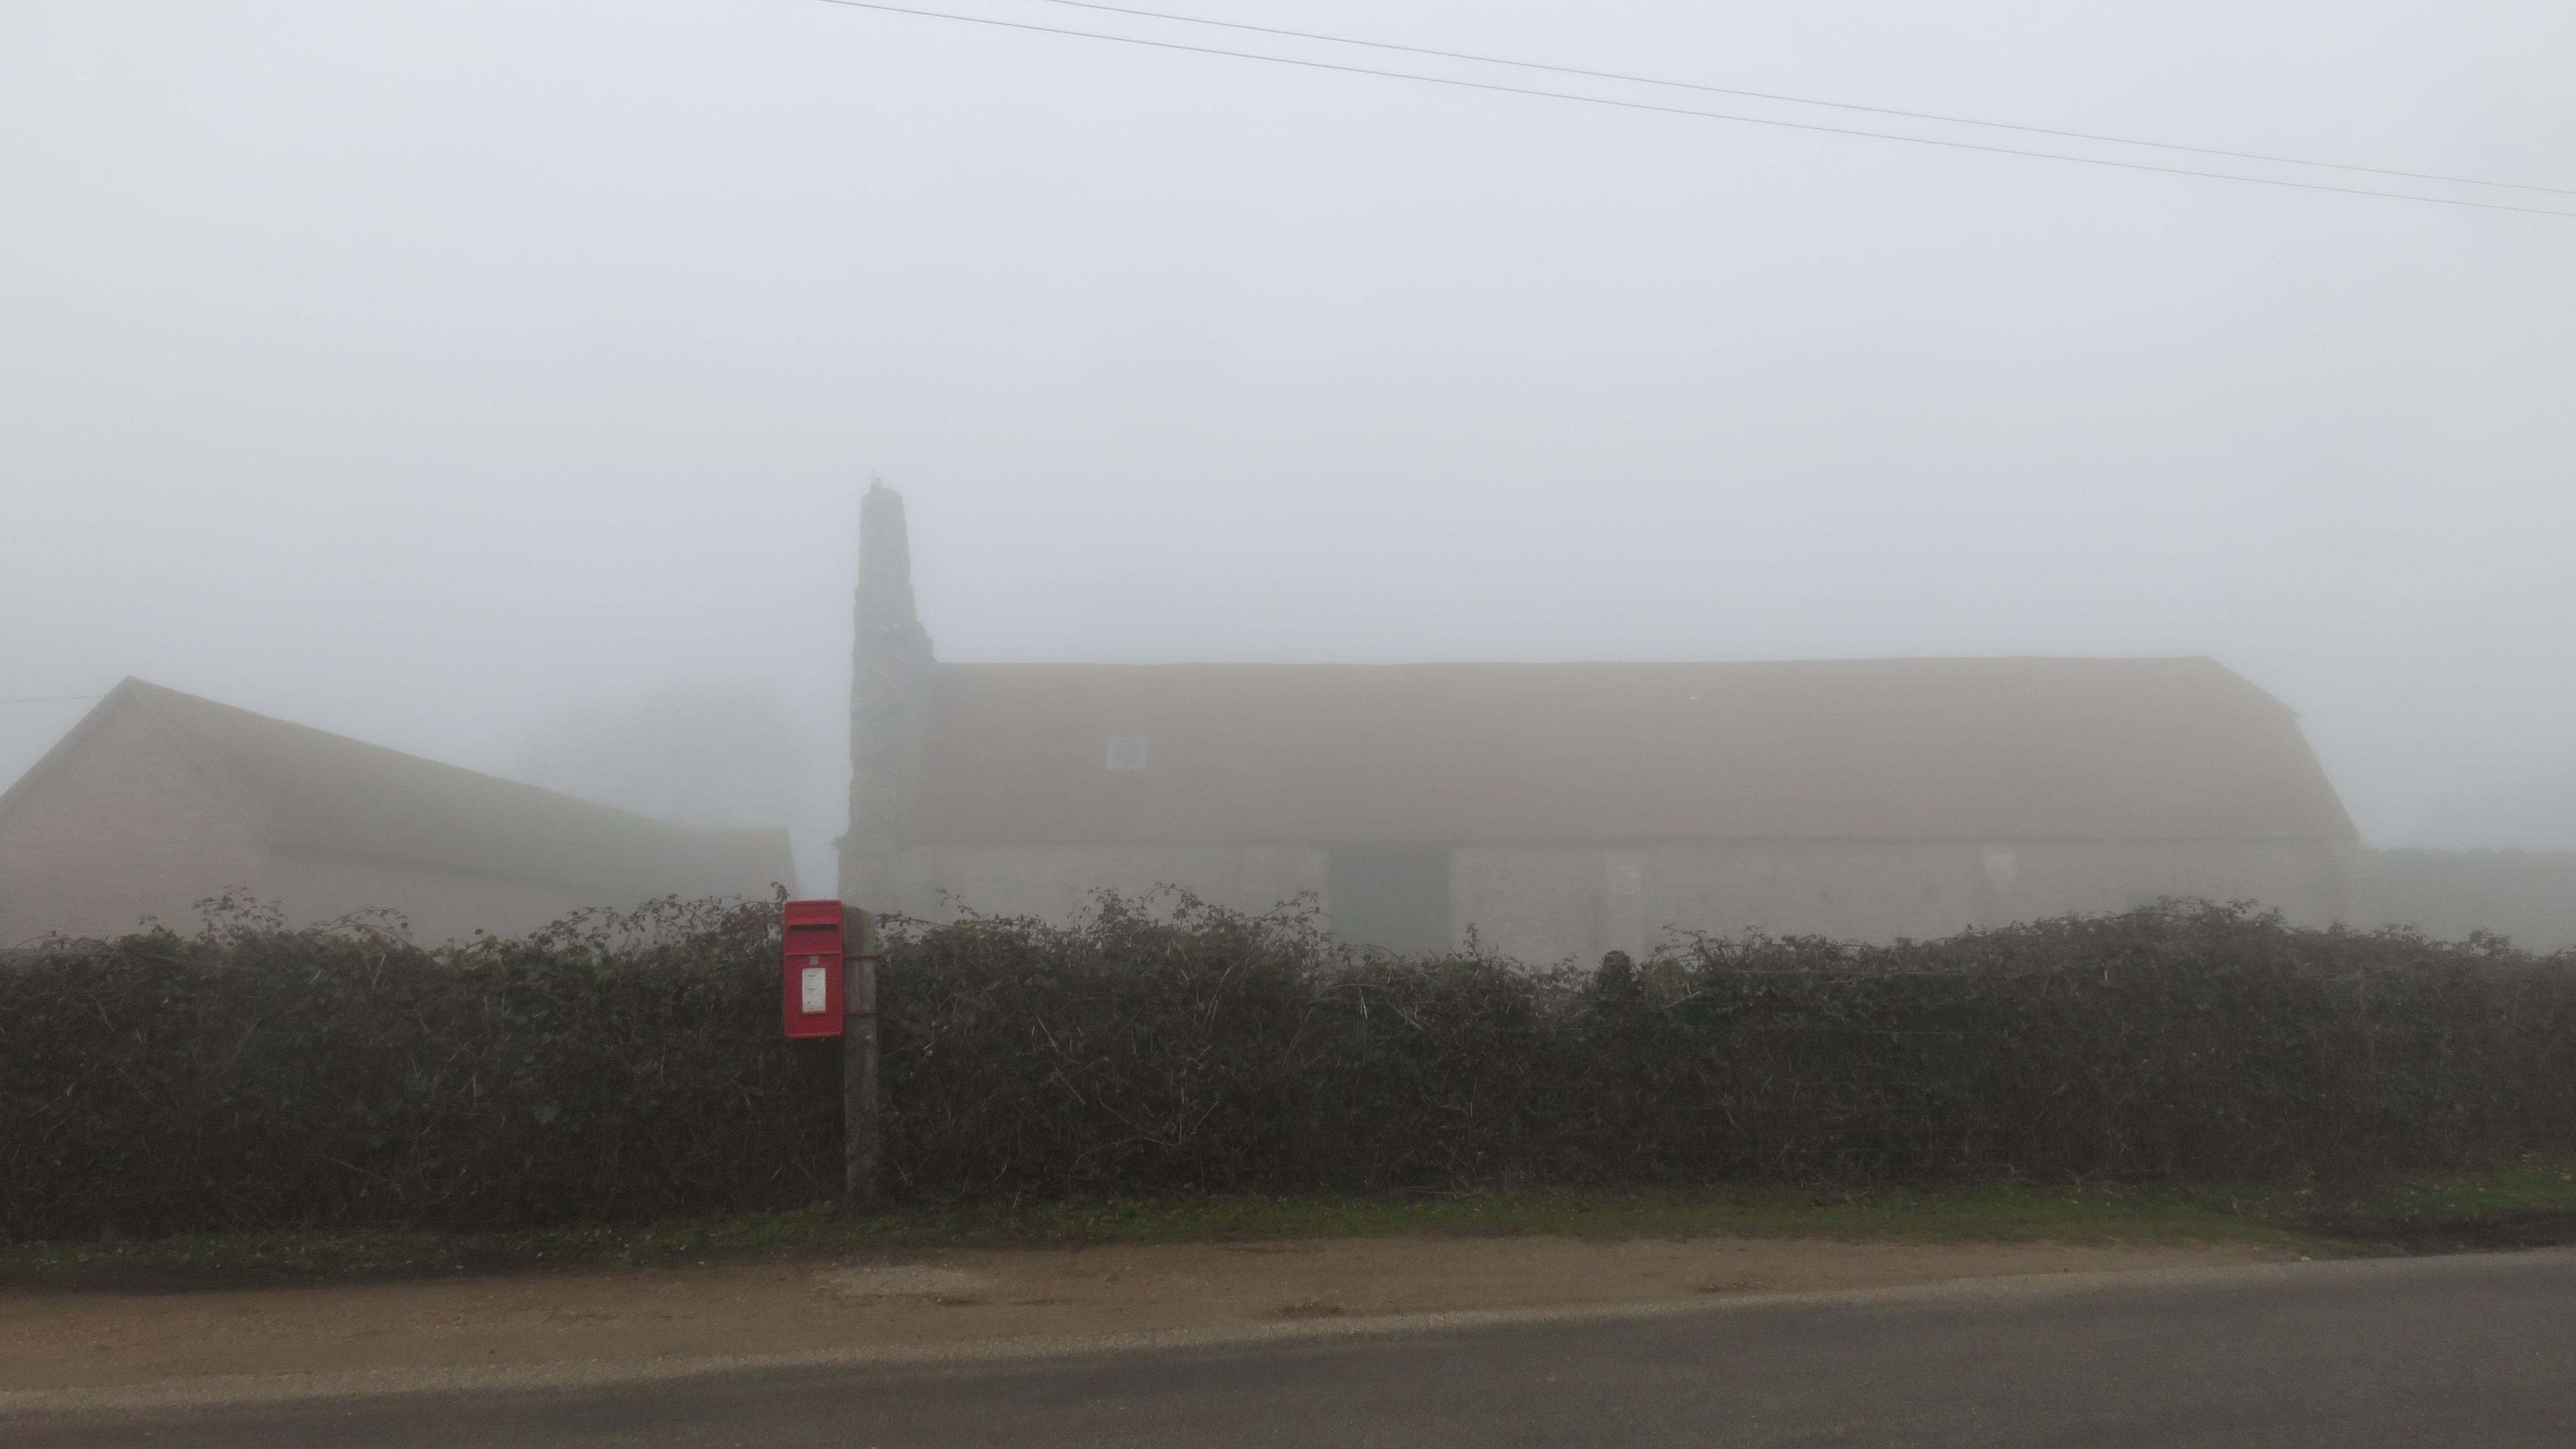 St. Leonard's Grange with post box in fog